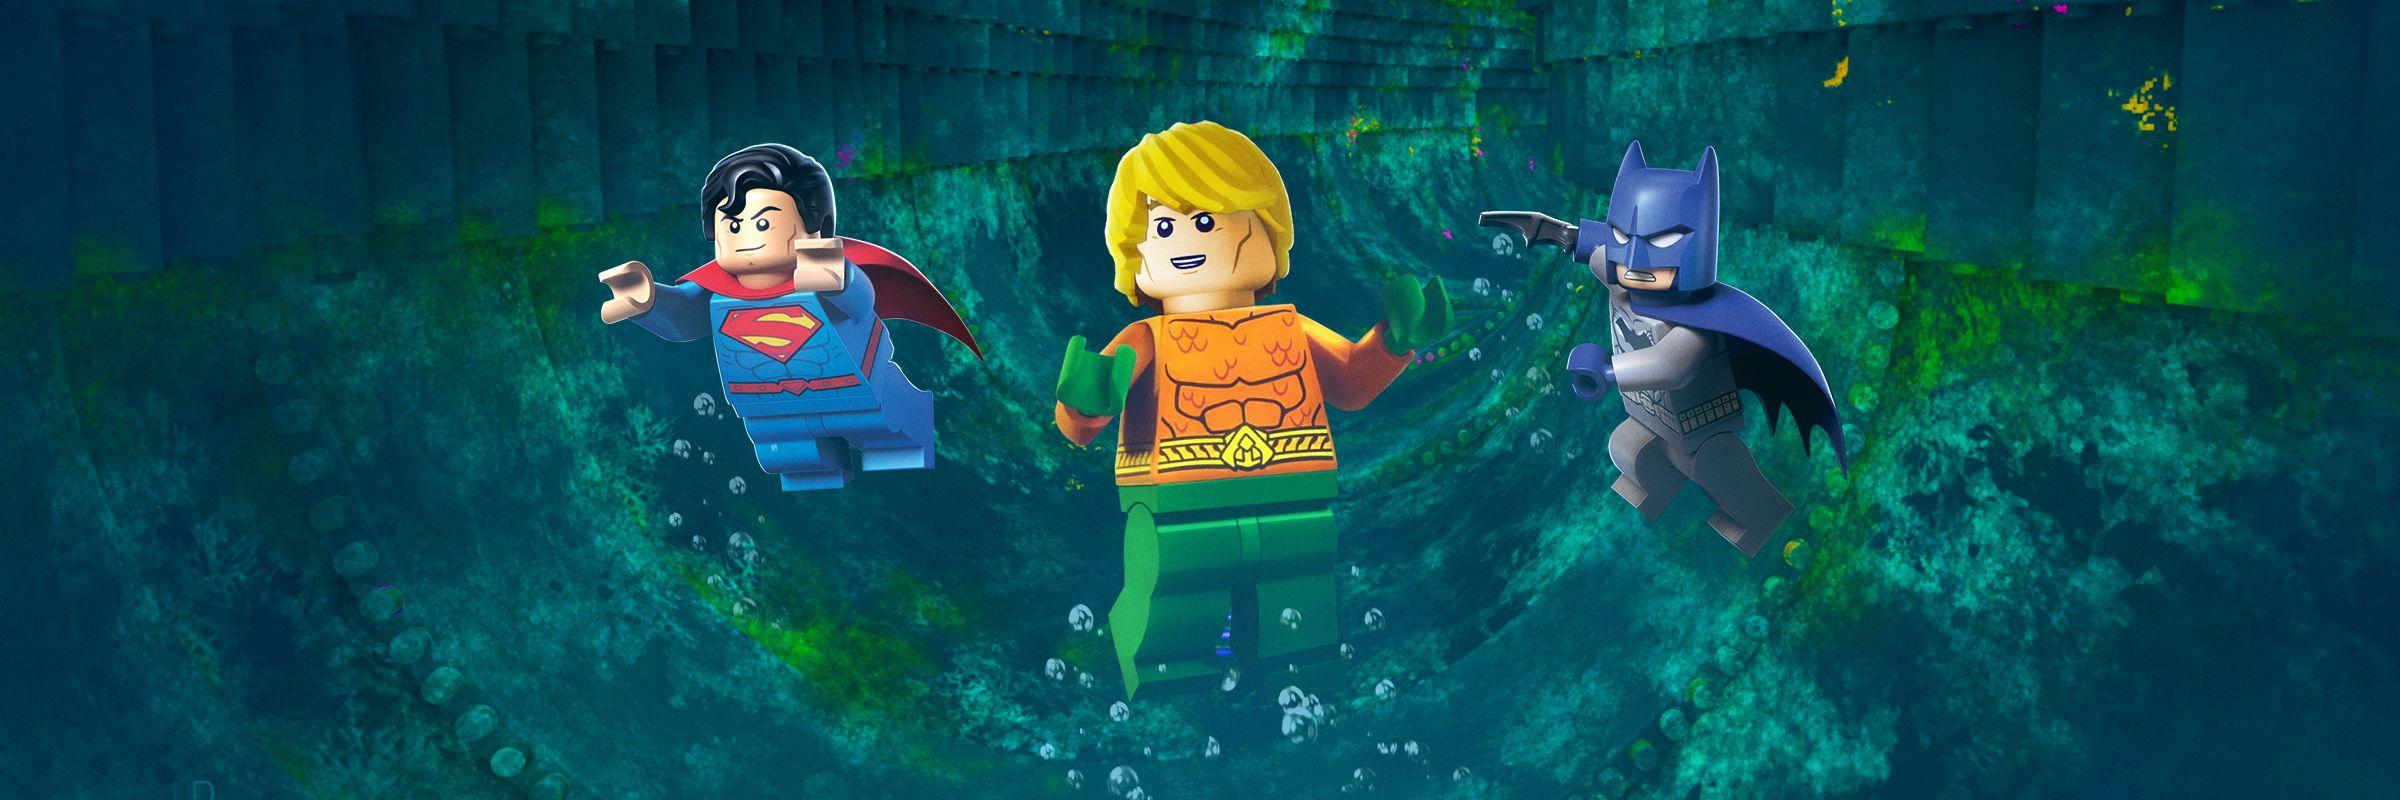 Lego Dc Comics Super Heroes Aquaman Rage Of Atlantis Full Movie Movies Anywhere